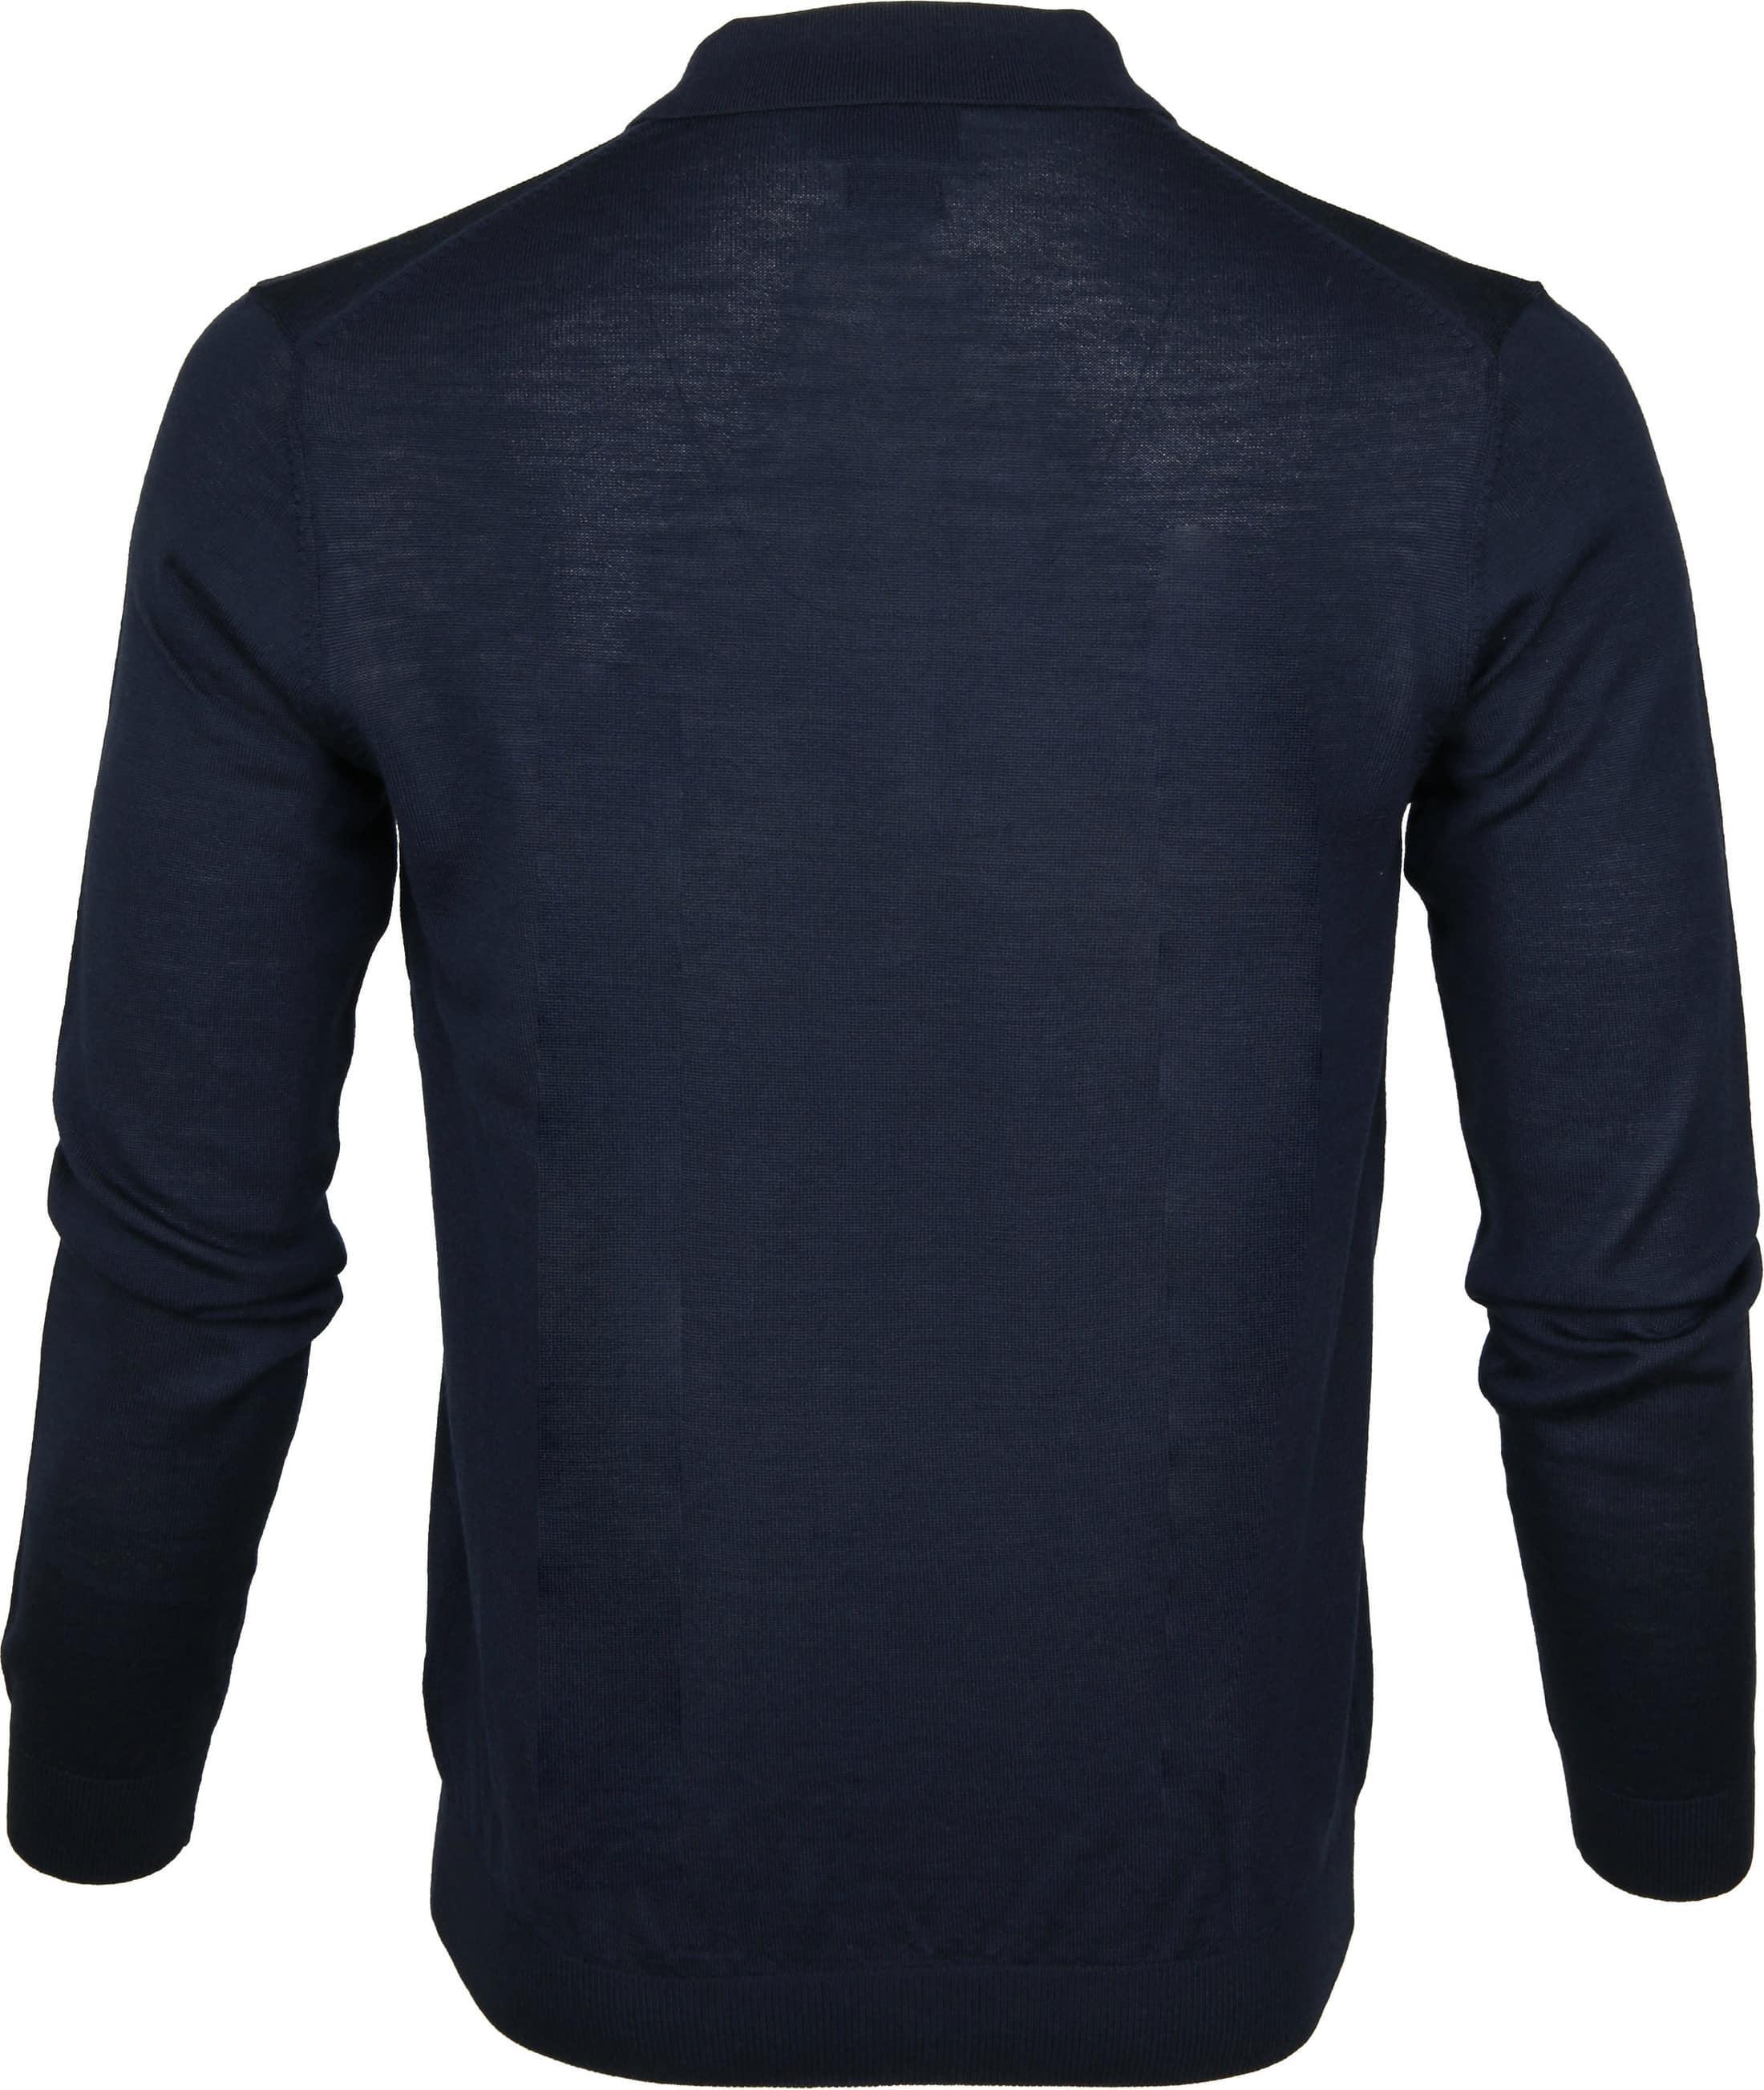 Profuomo Longsleeve Poloshirt Navy foto 3